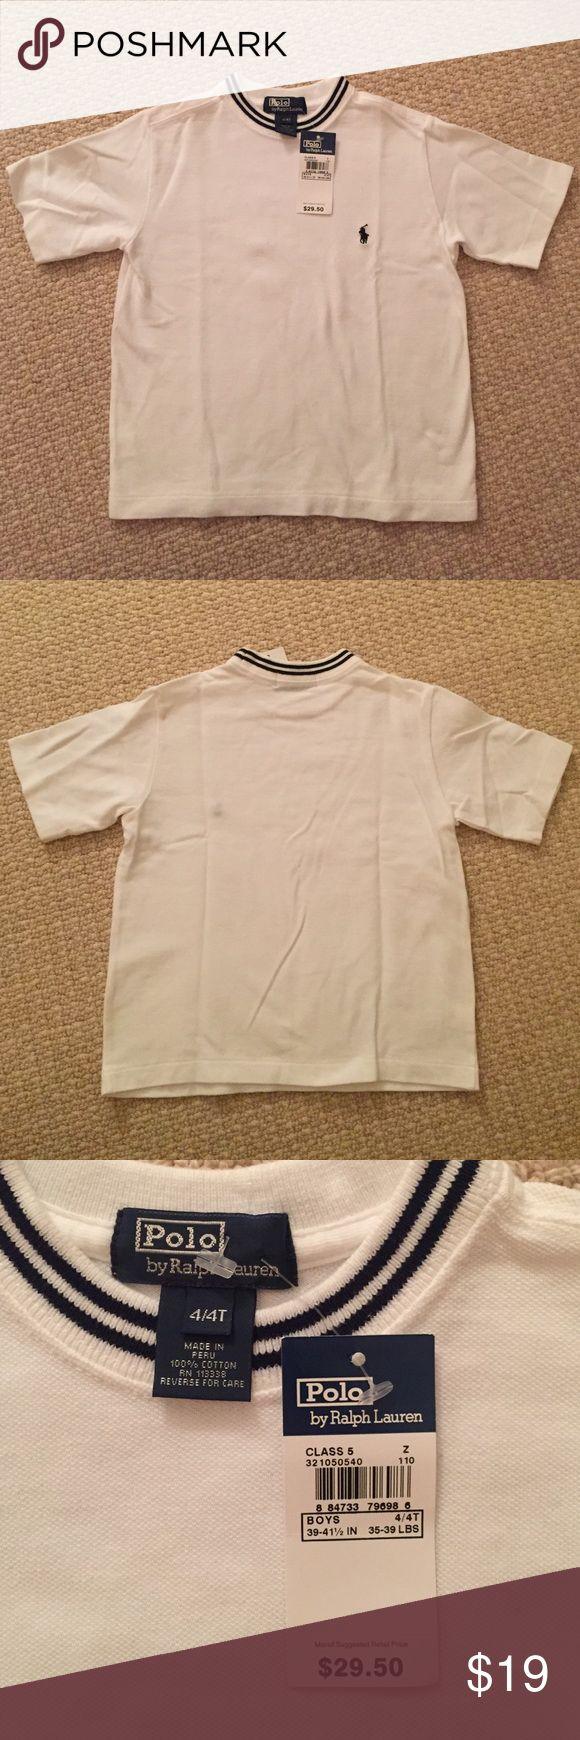 Polo by Ralph Lauren Pique Polo Shirt Sz 4/4T Polo by Ralph Lauren Pique Polo Sz 4/4T. Crew neck tee style, pique fabric. NWT. Navy trim around neck. Love this shirt!!! Polo by Ralph Lauren Shirts & Tops Polos